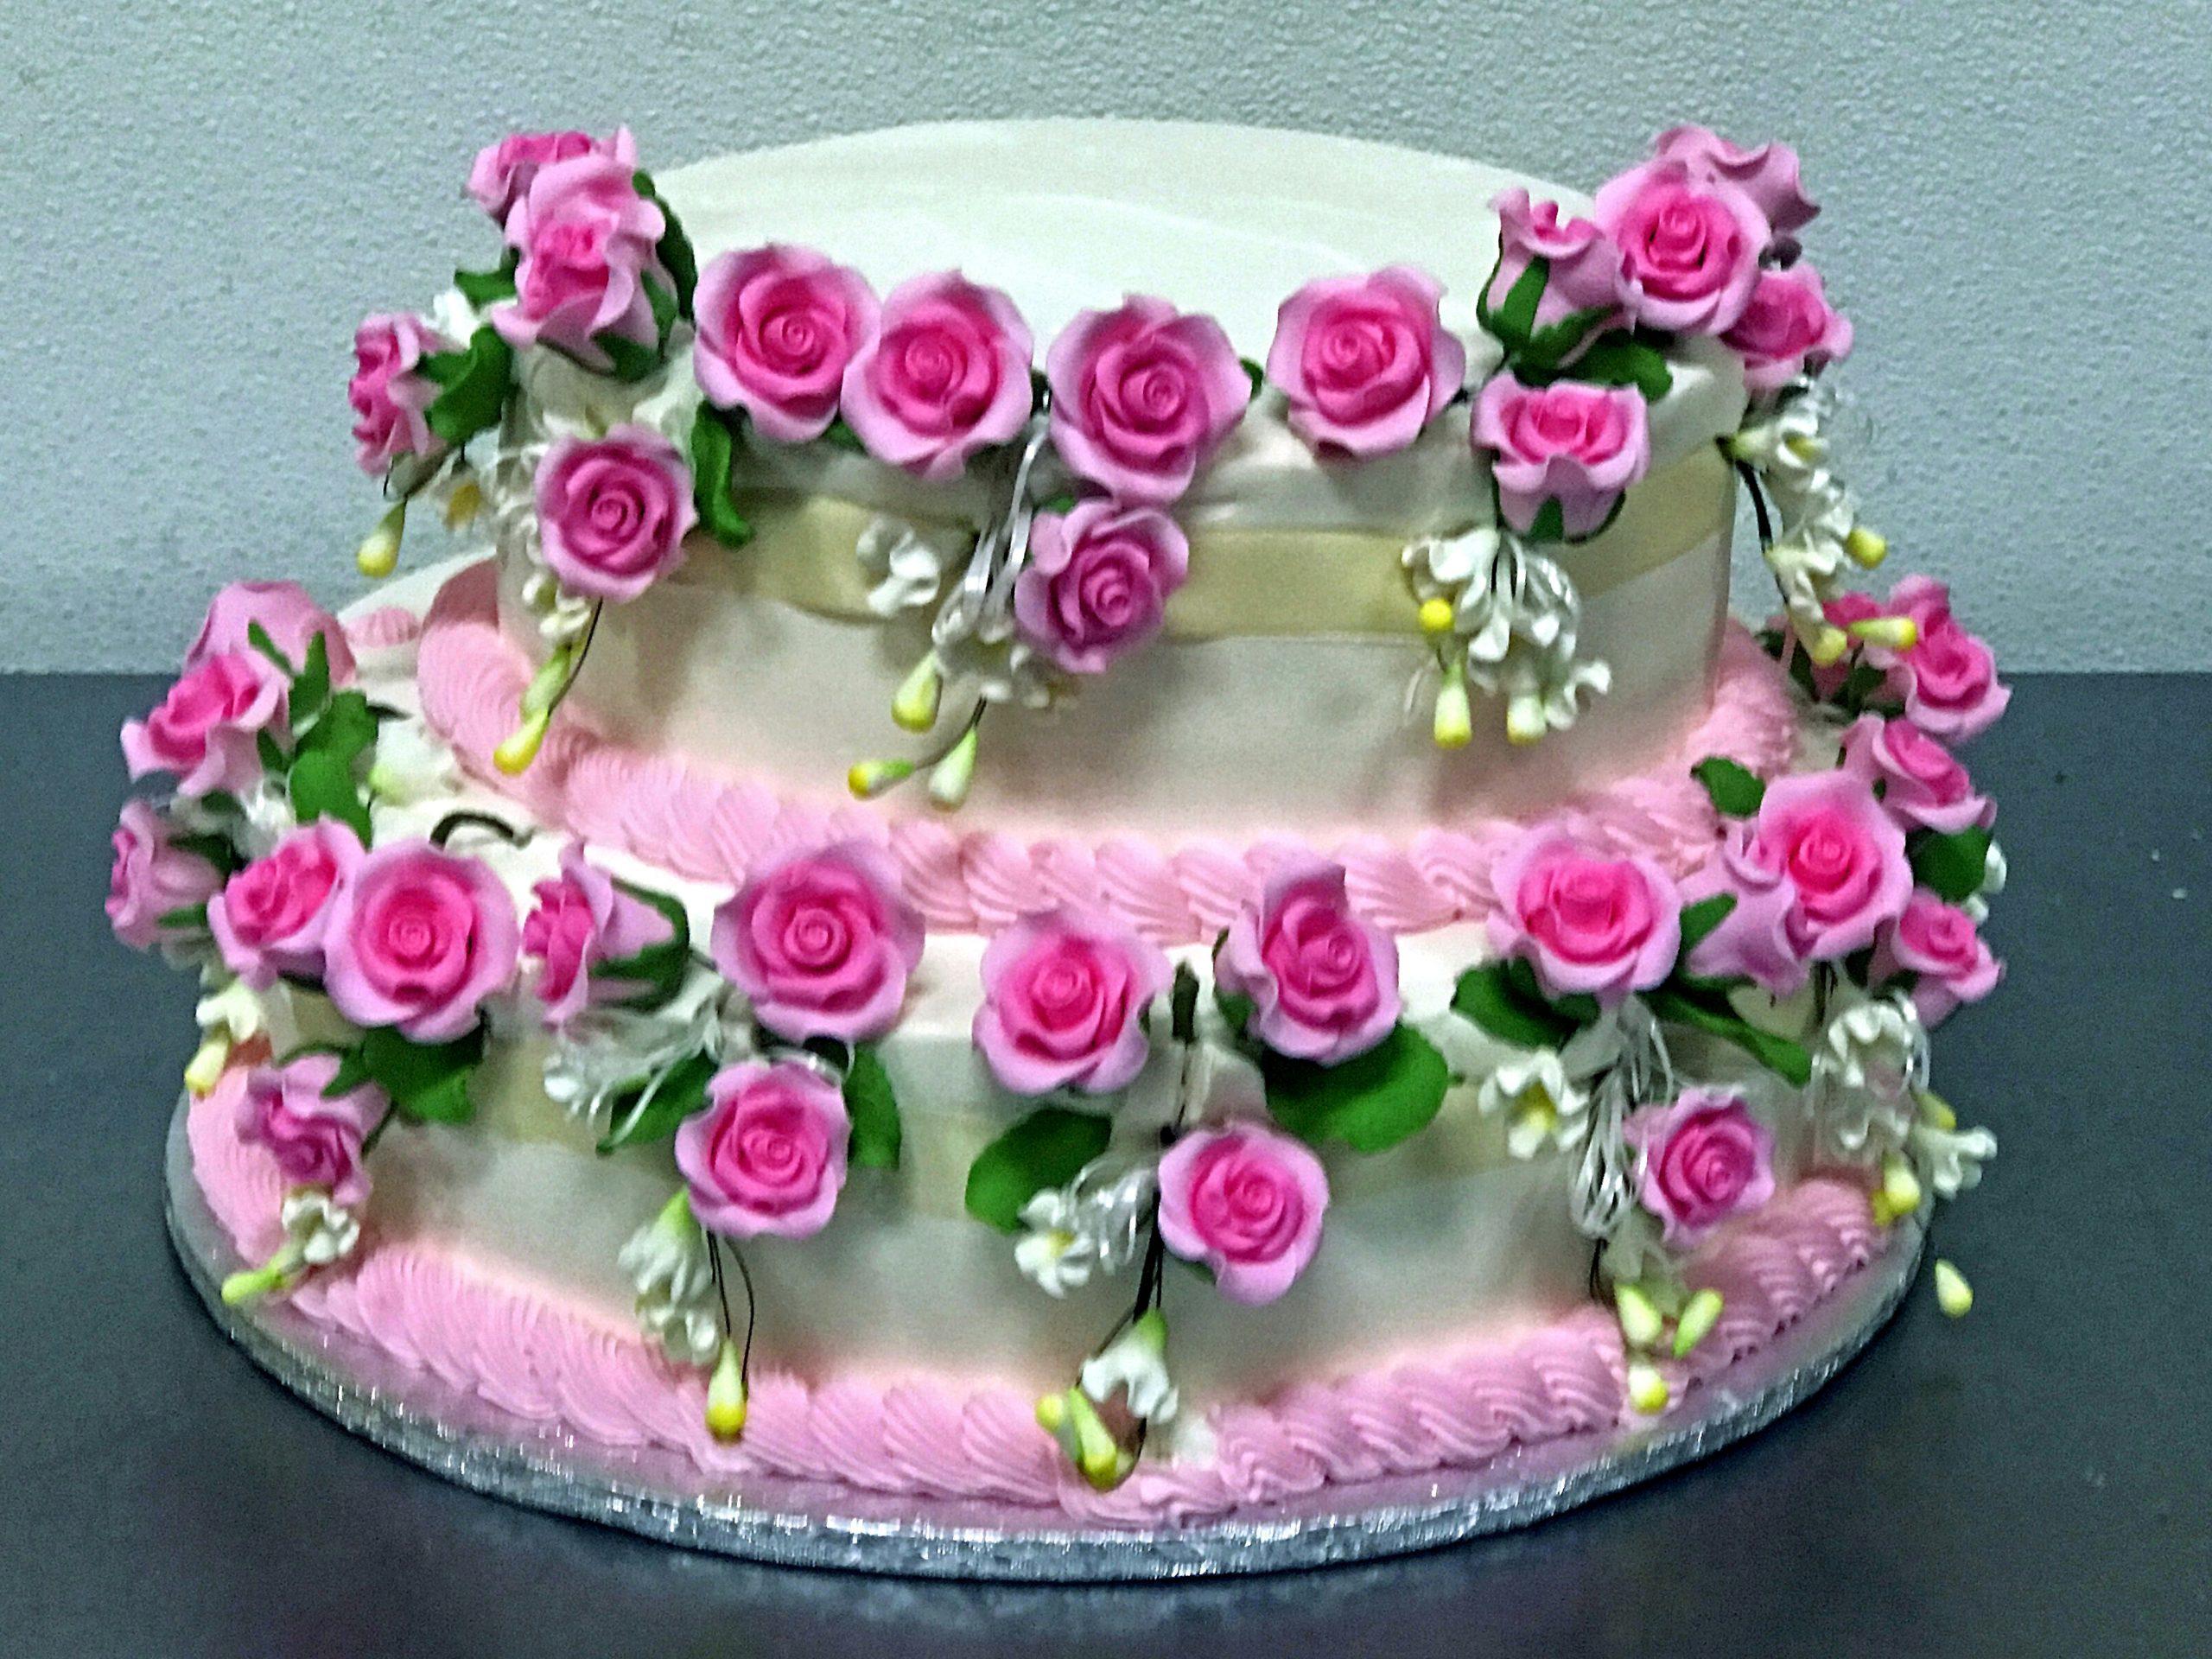 Lady's Cakes